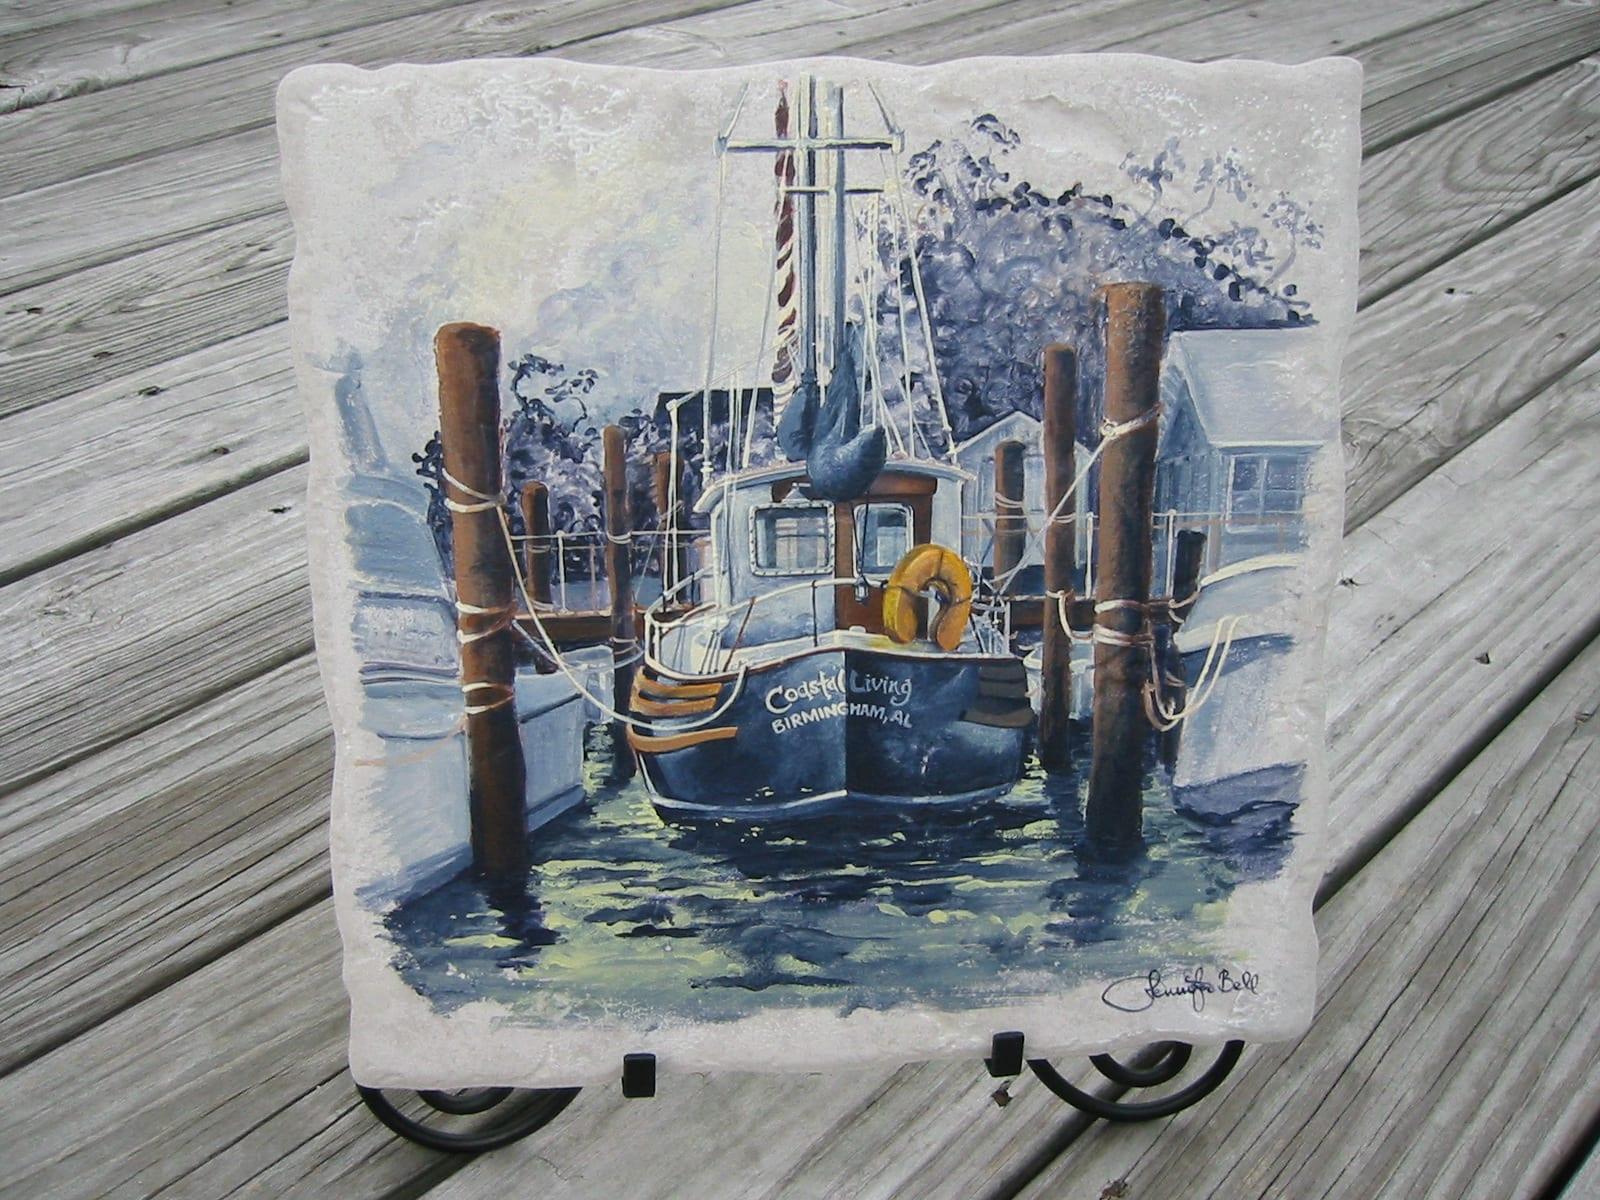 Artist Jen Bell's Sailboat Commission